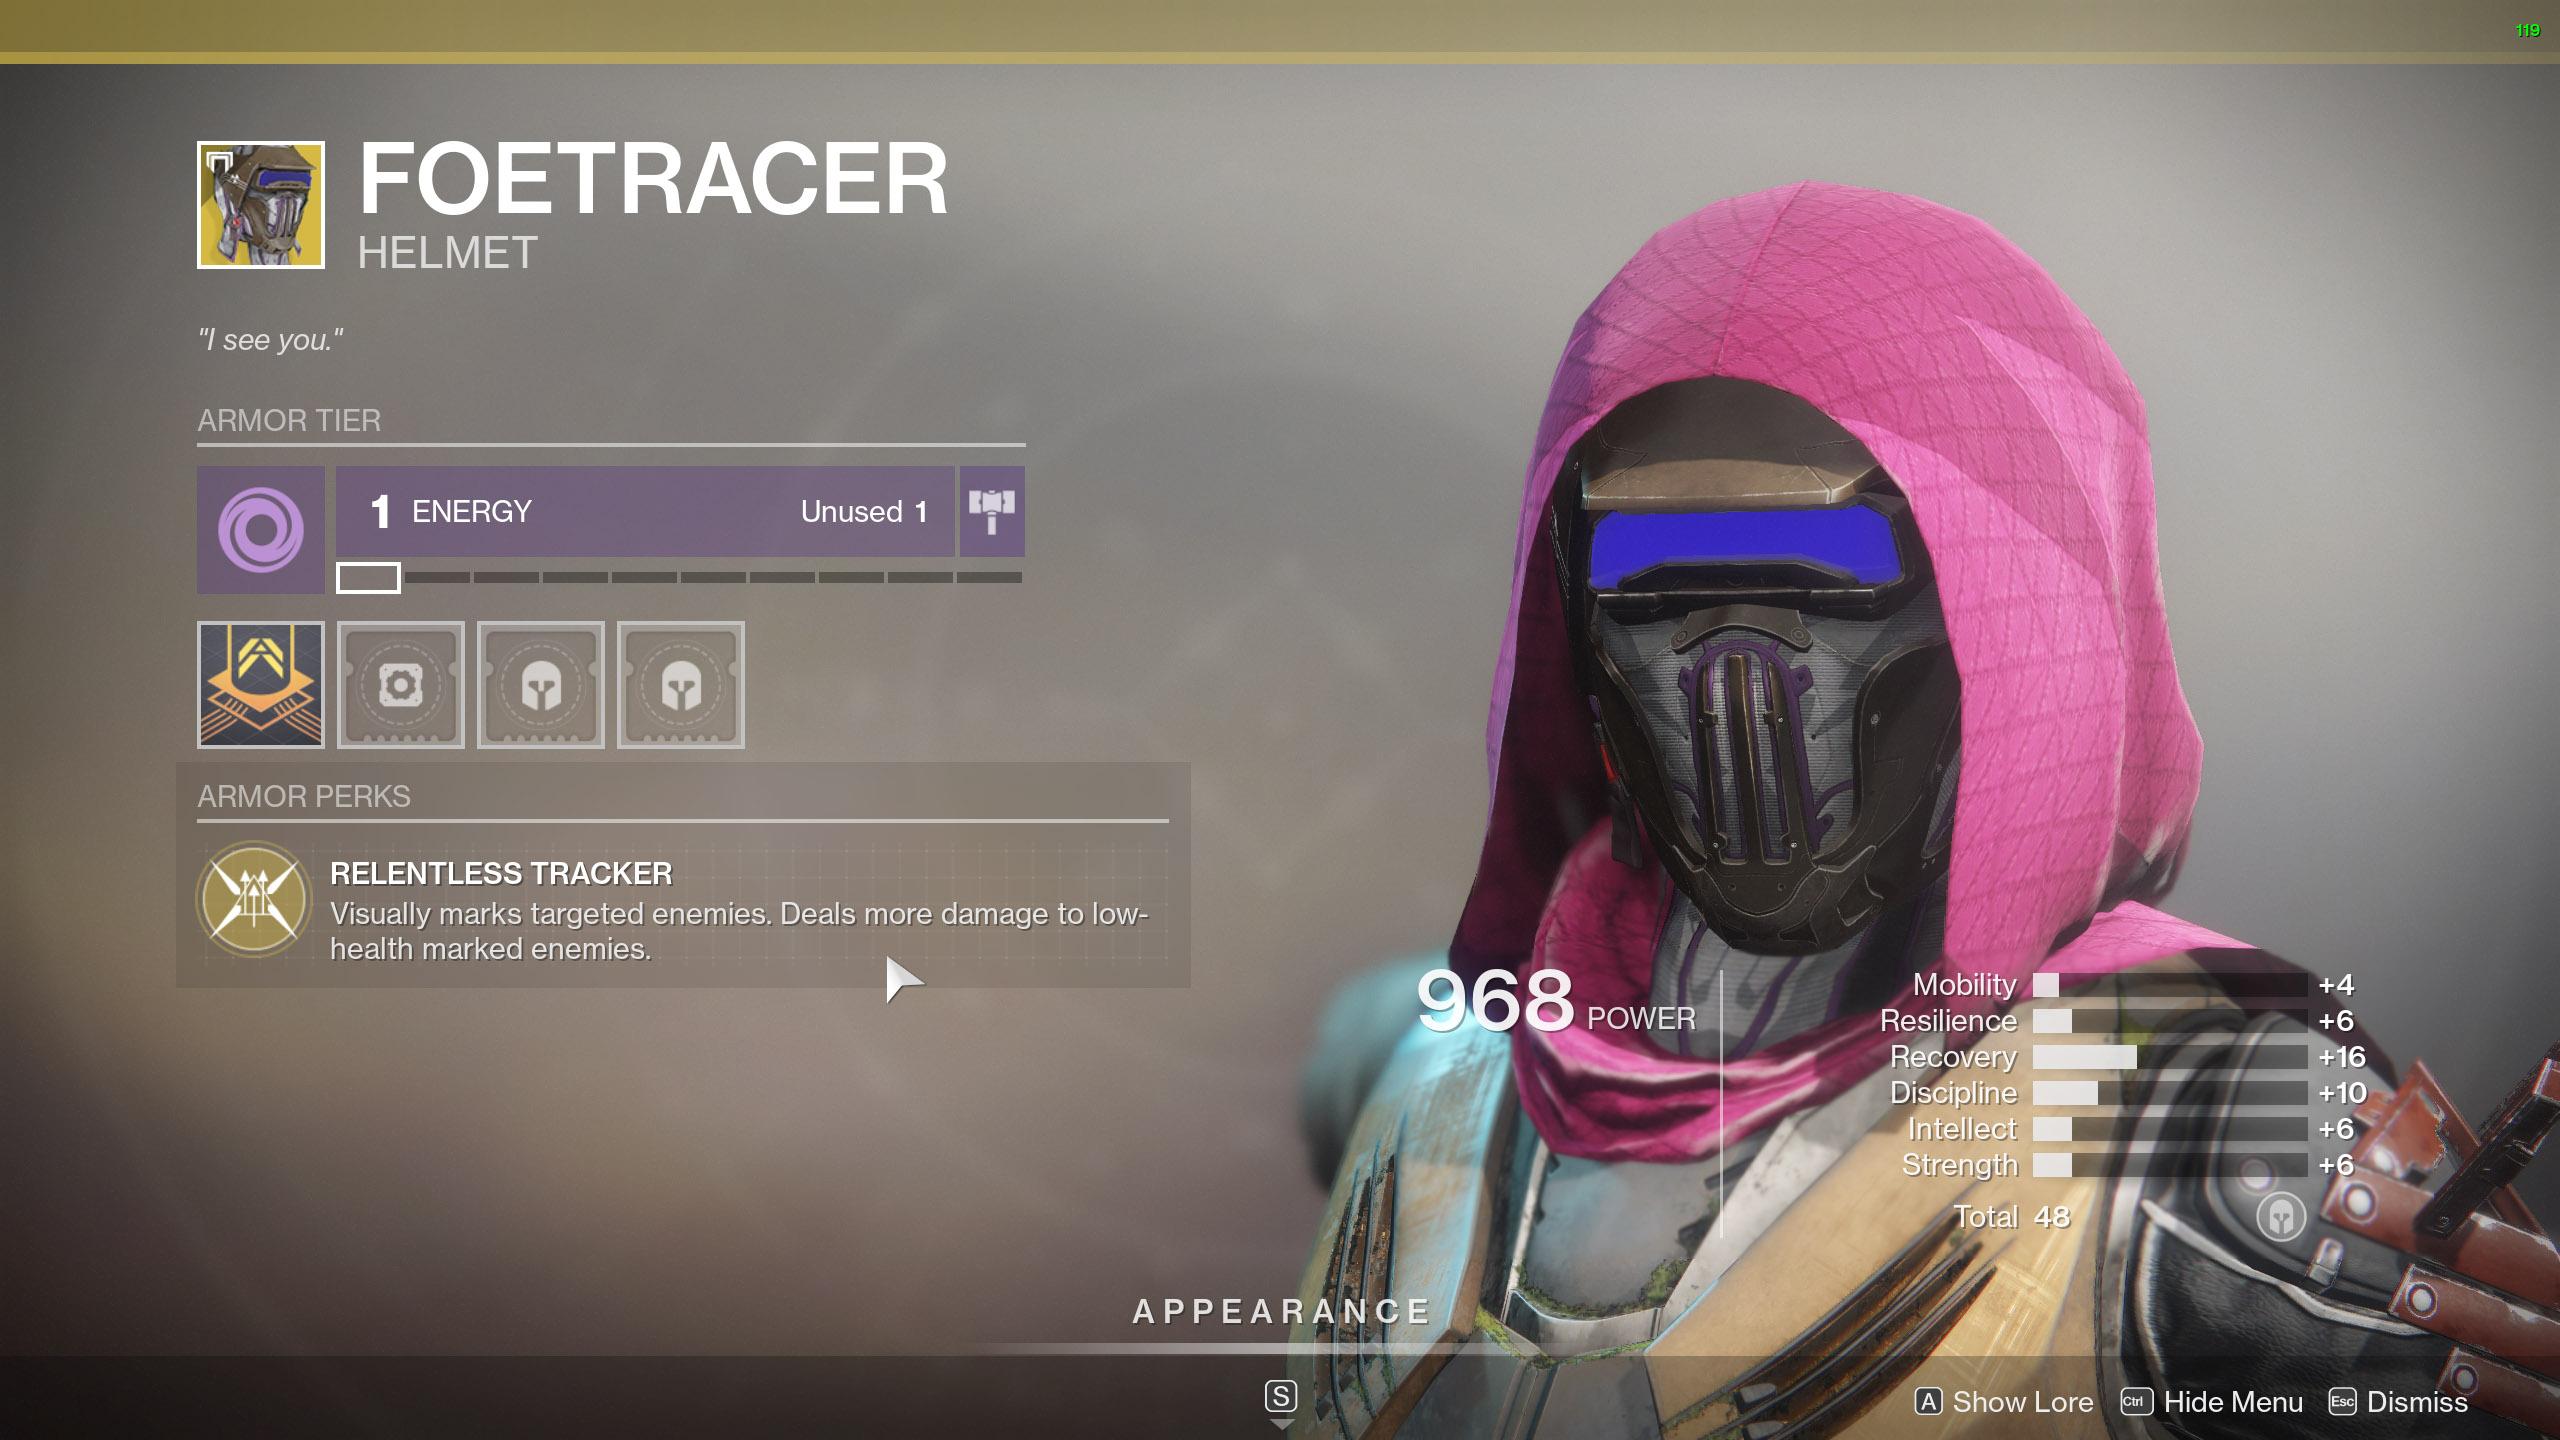 Destiny 2 Exotic Hunter armor Foetracer